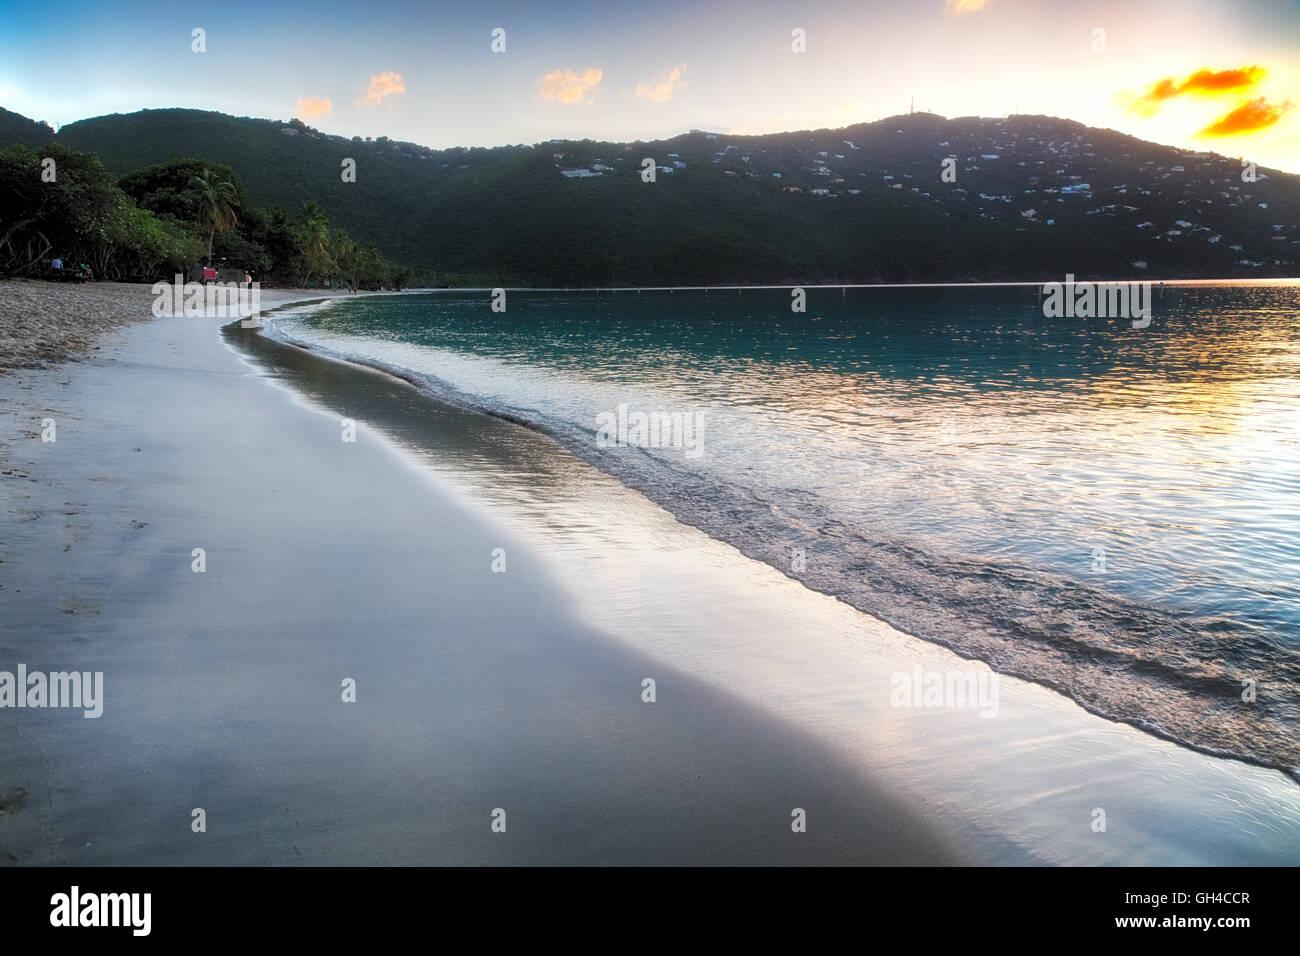 Tranquil Caribbean Beach at Sunset, Magens Bay, St Thomas, US Virgin Islands - Stock Image